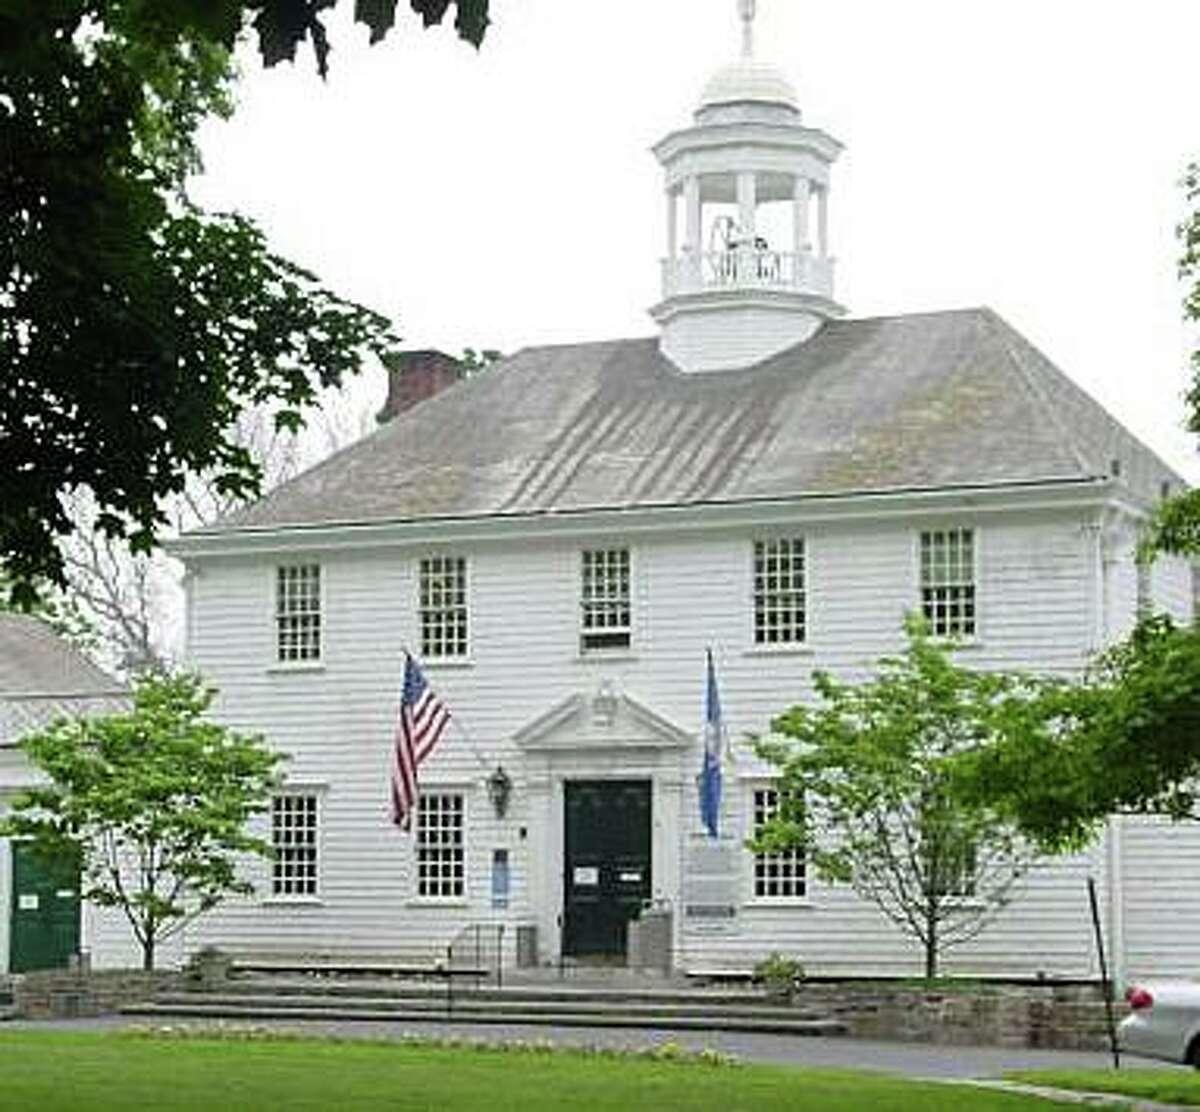 Old Town Hall in Fairfield, Conn.